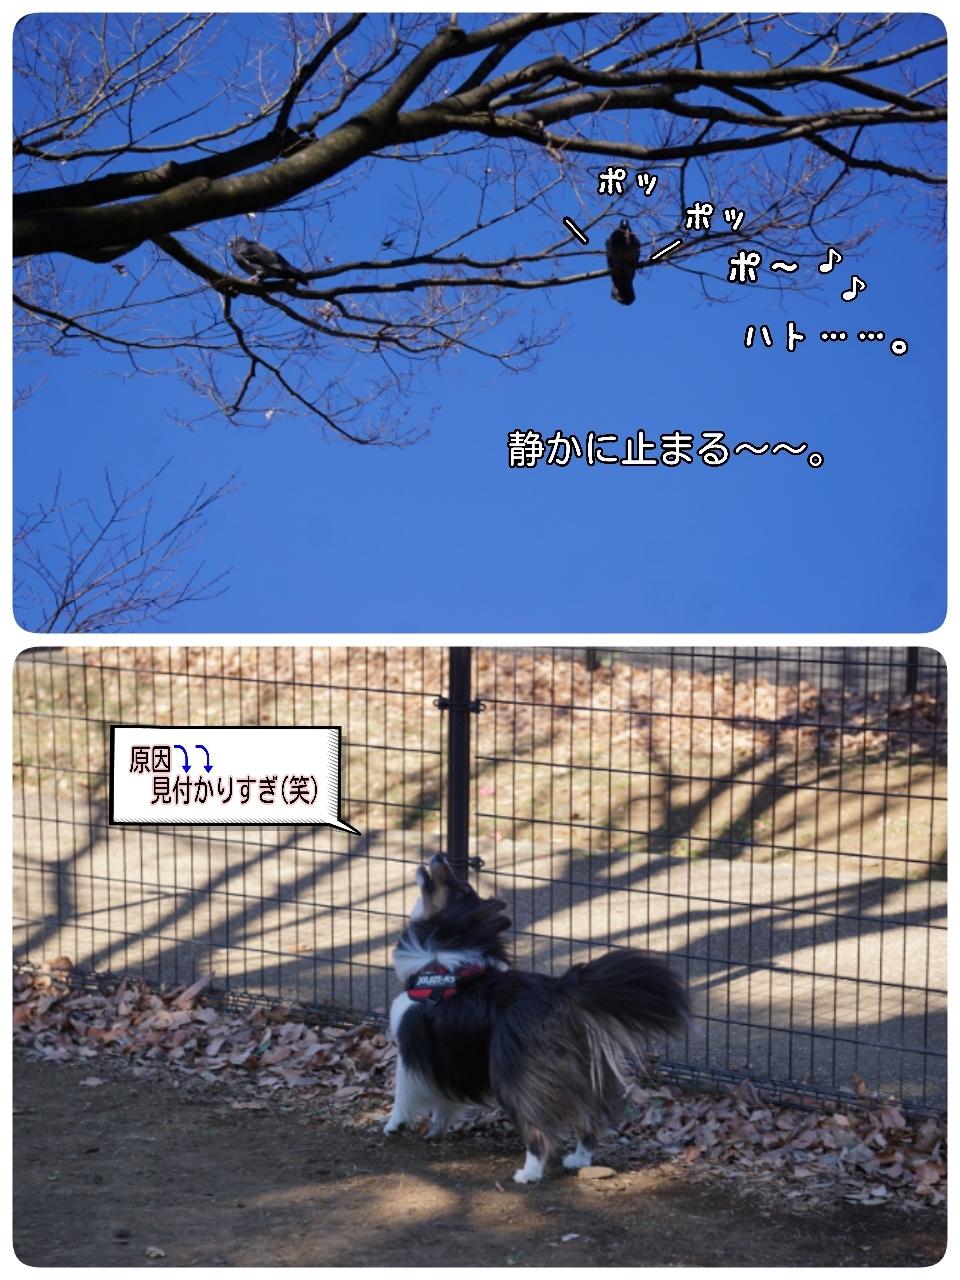 17-02-12-11-01-22-950_deco.jpg